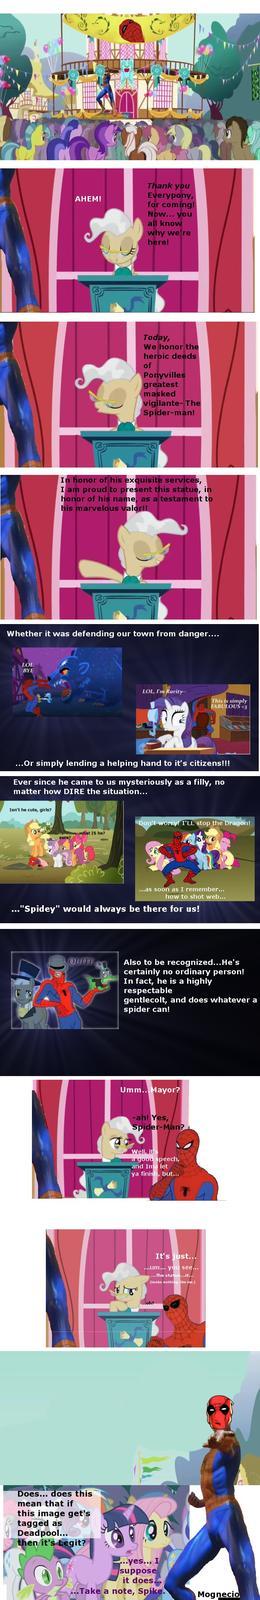 spidey__hero_of_ponyville_by_mogneciothebrave-d423i00.jpg